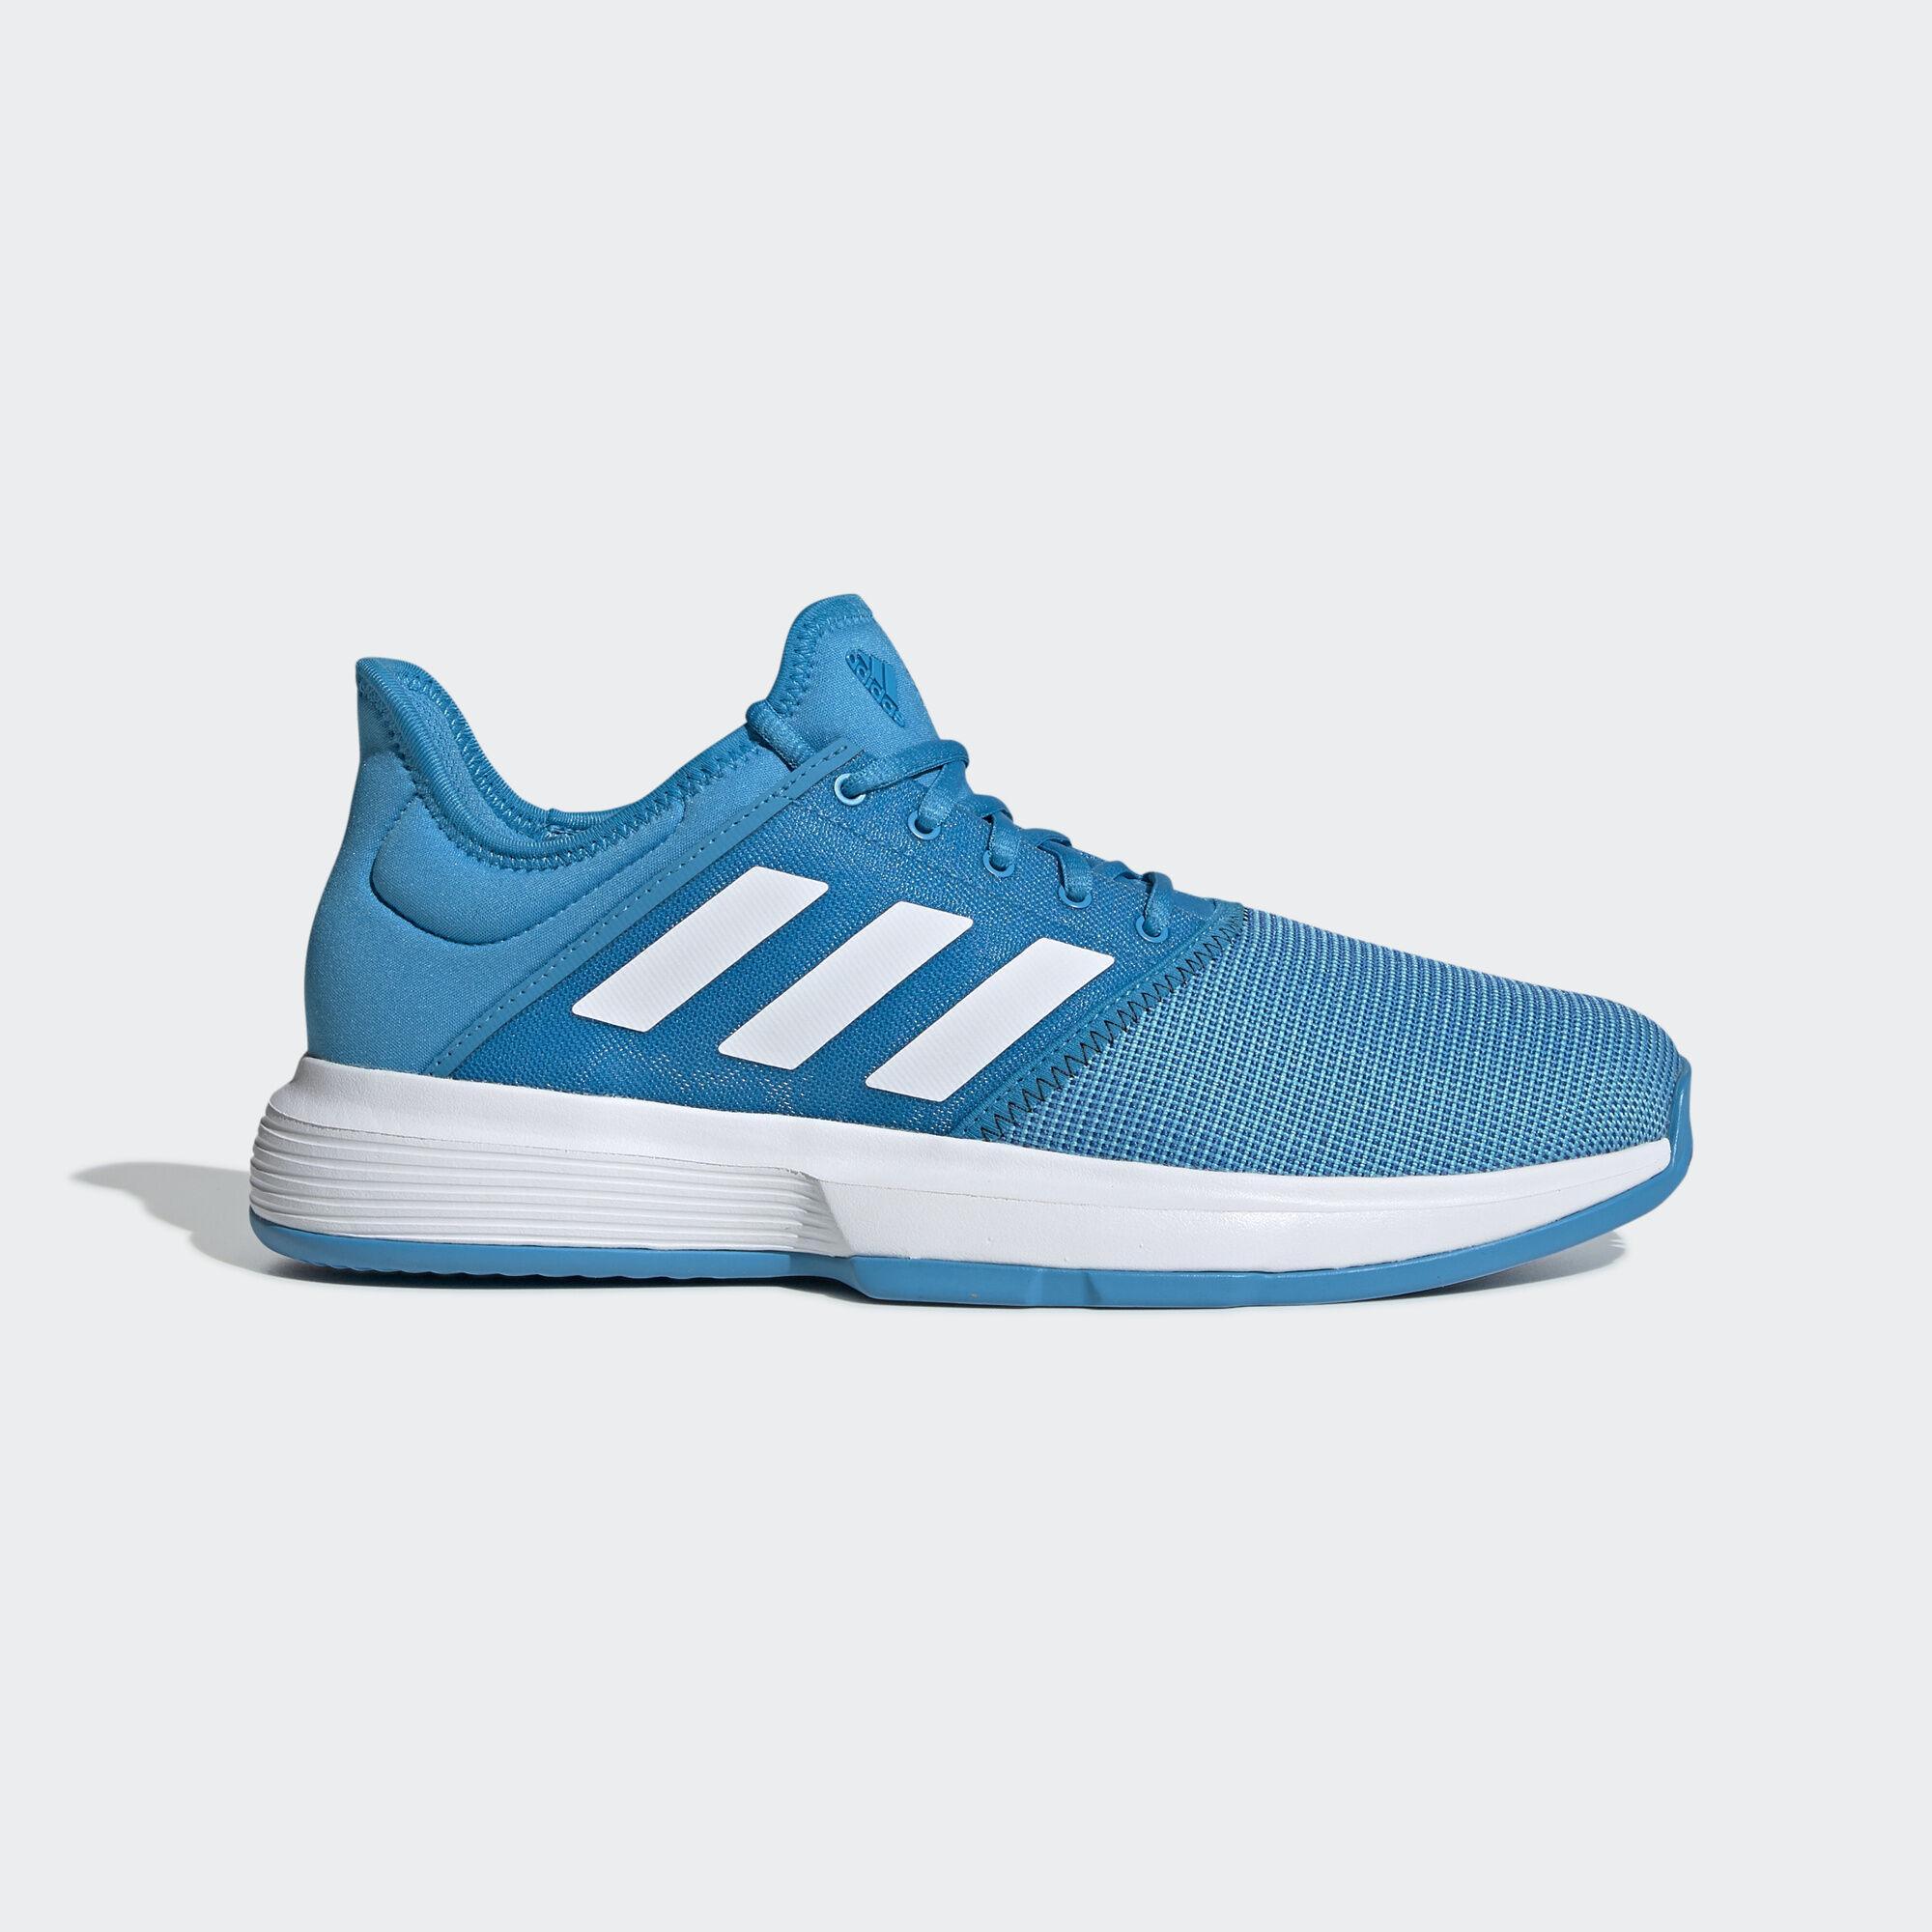 Adidas Mens GameCourt Tennis Shoes - Blue